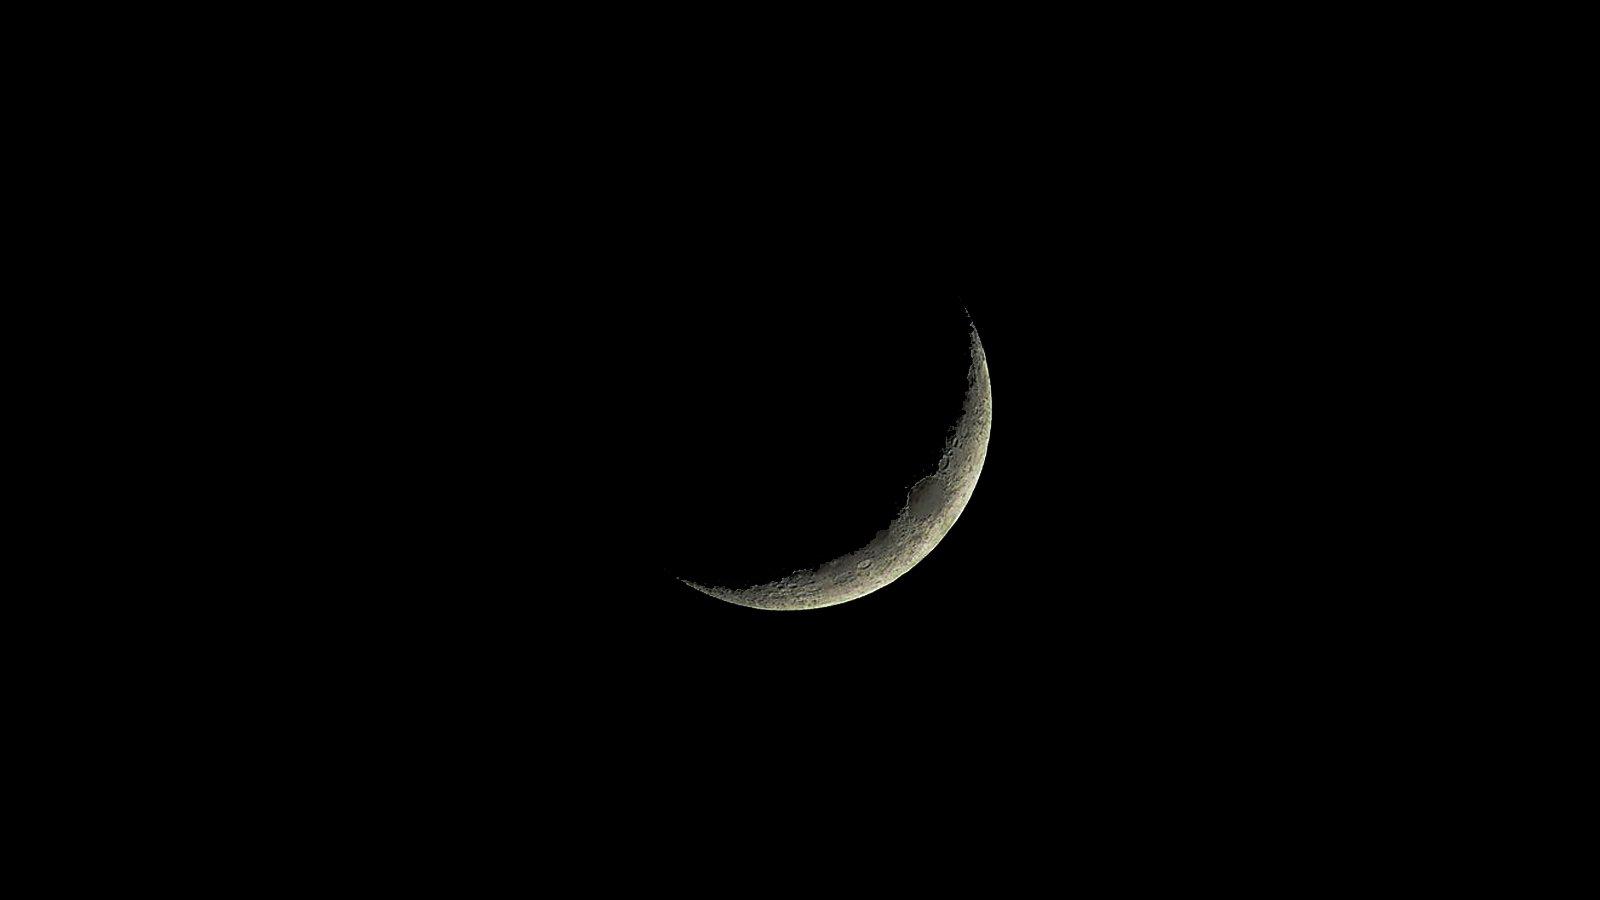 Hoş Geldin Ramazan! post thumbnail